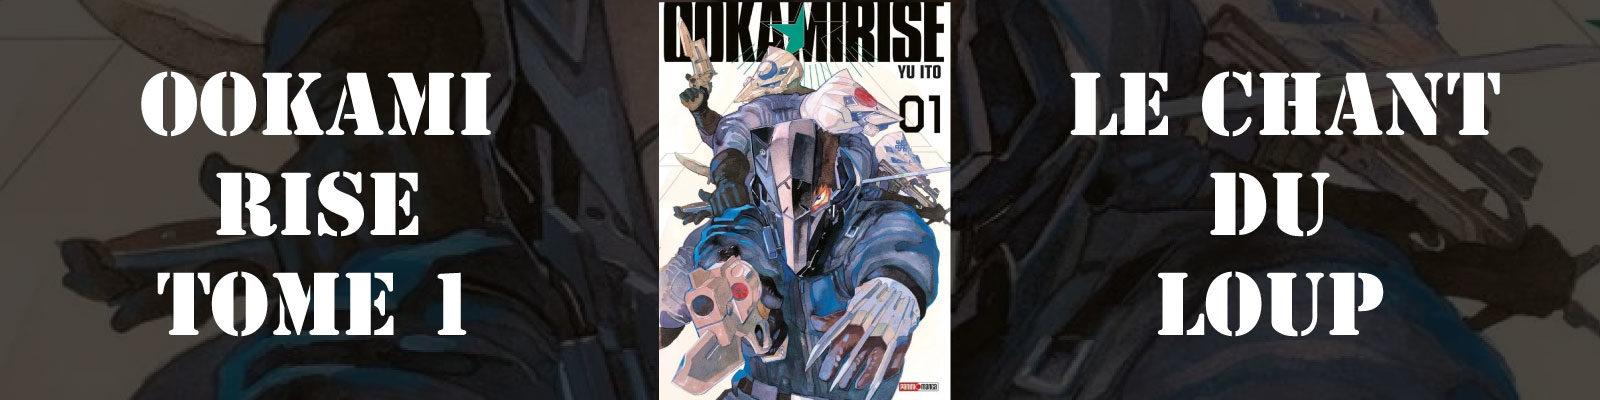 Ookami Rise-Vol.-1